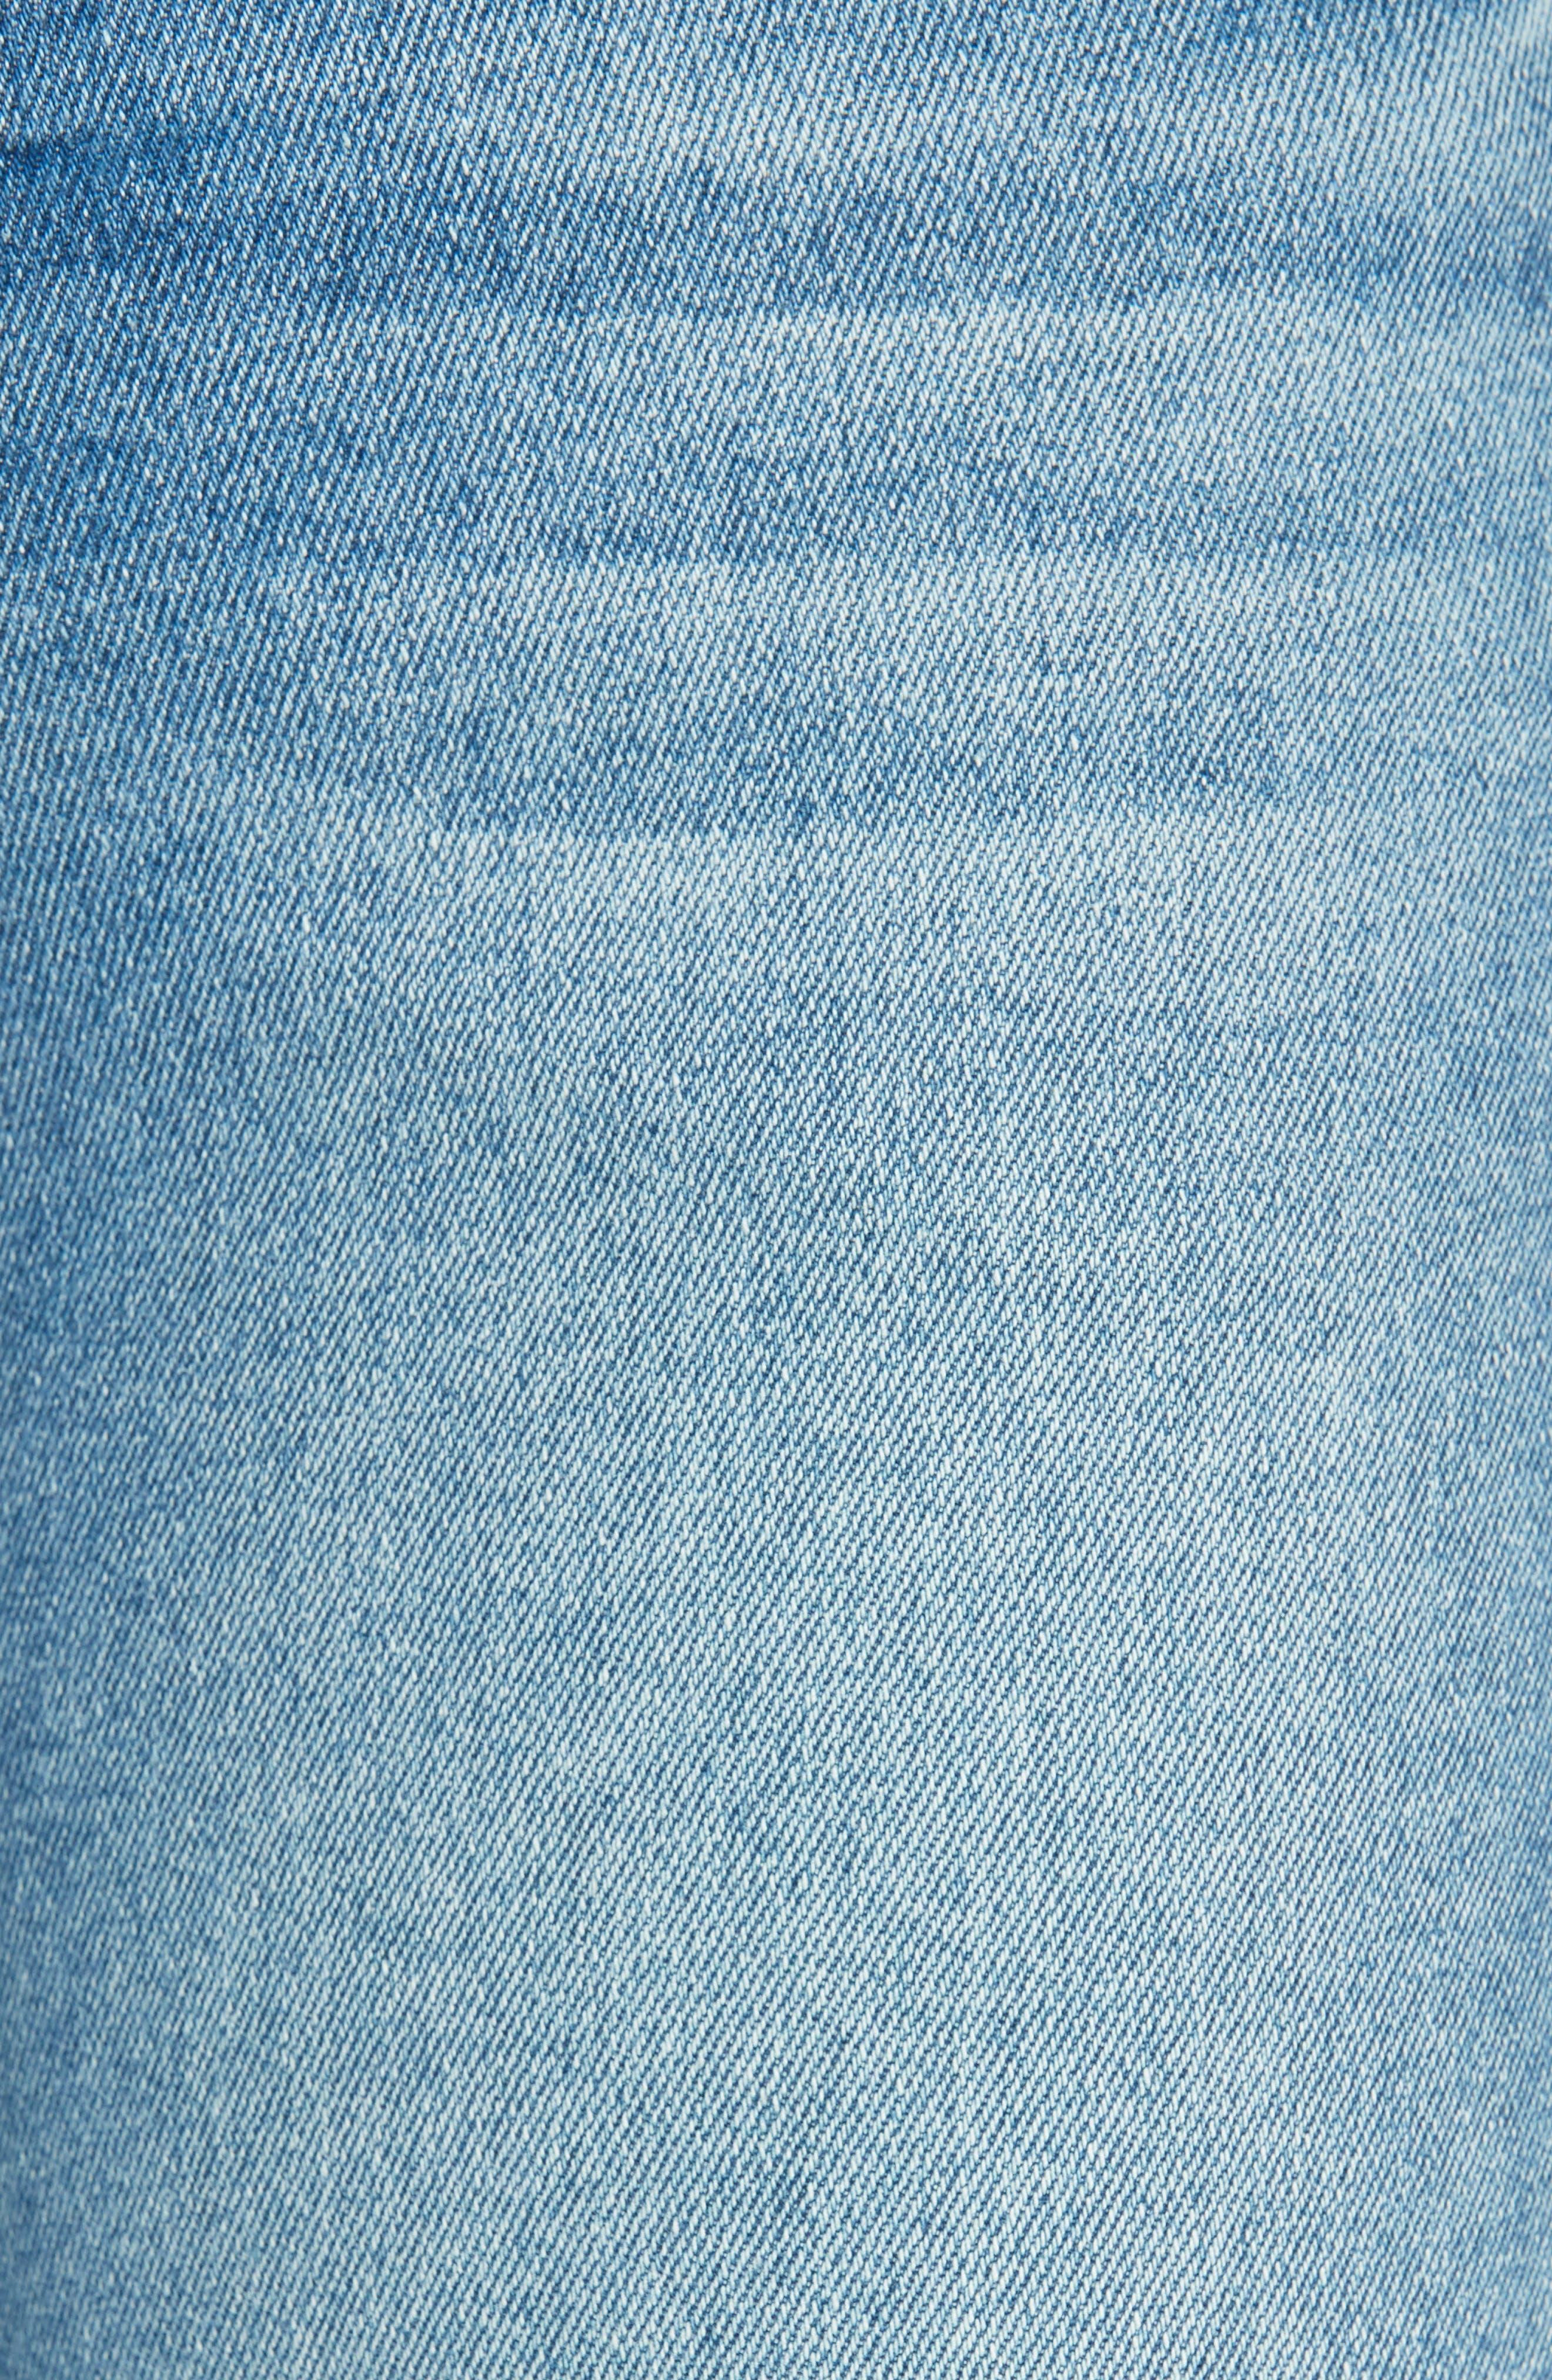 Le High Skinny Jeans,                             Alternate thumbnail 6, color,                             DUPONT DRIVE